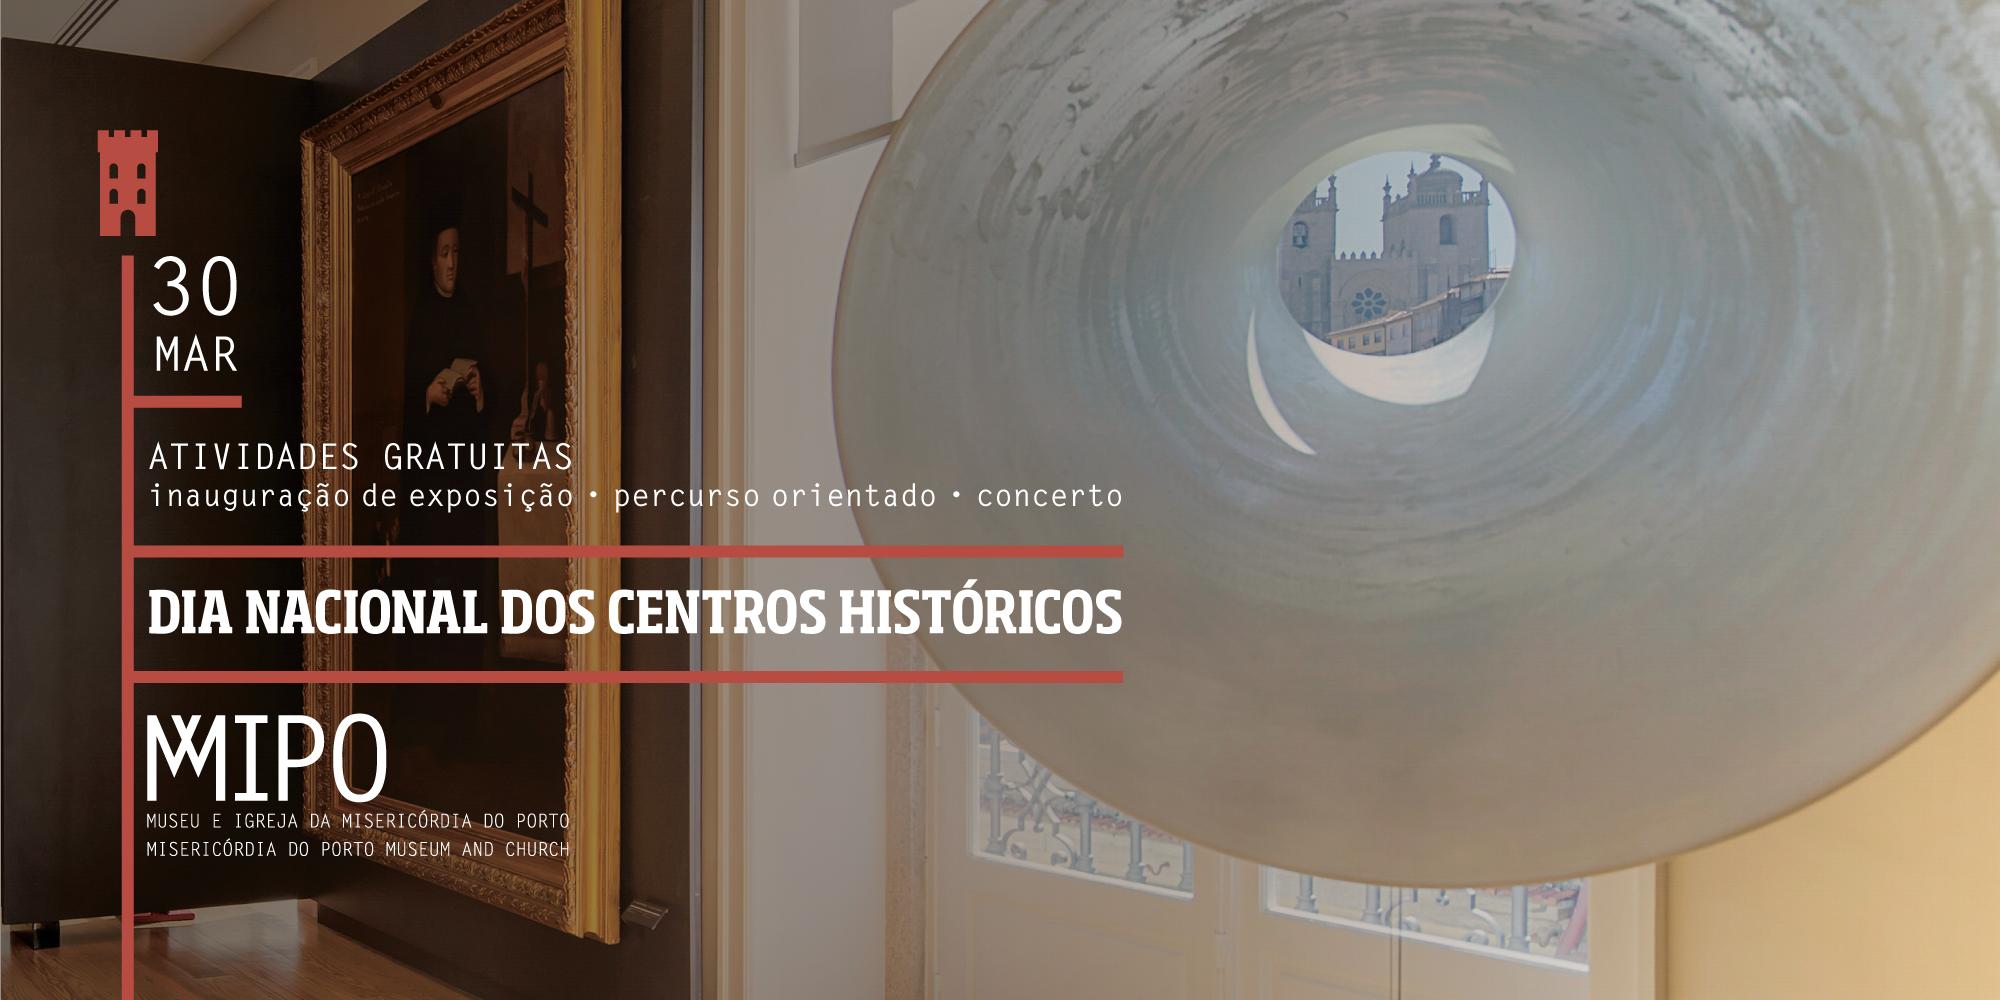 https://www.scmp.pt/assets/misc/img/2019/slideshow/2019-03-30%20Dia%20Nacional%20dos%20Centros%20hist%C3%B3ricos/MMIPO-dia-nacional-centros-historicos-banner-site.jpg